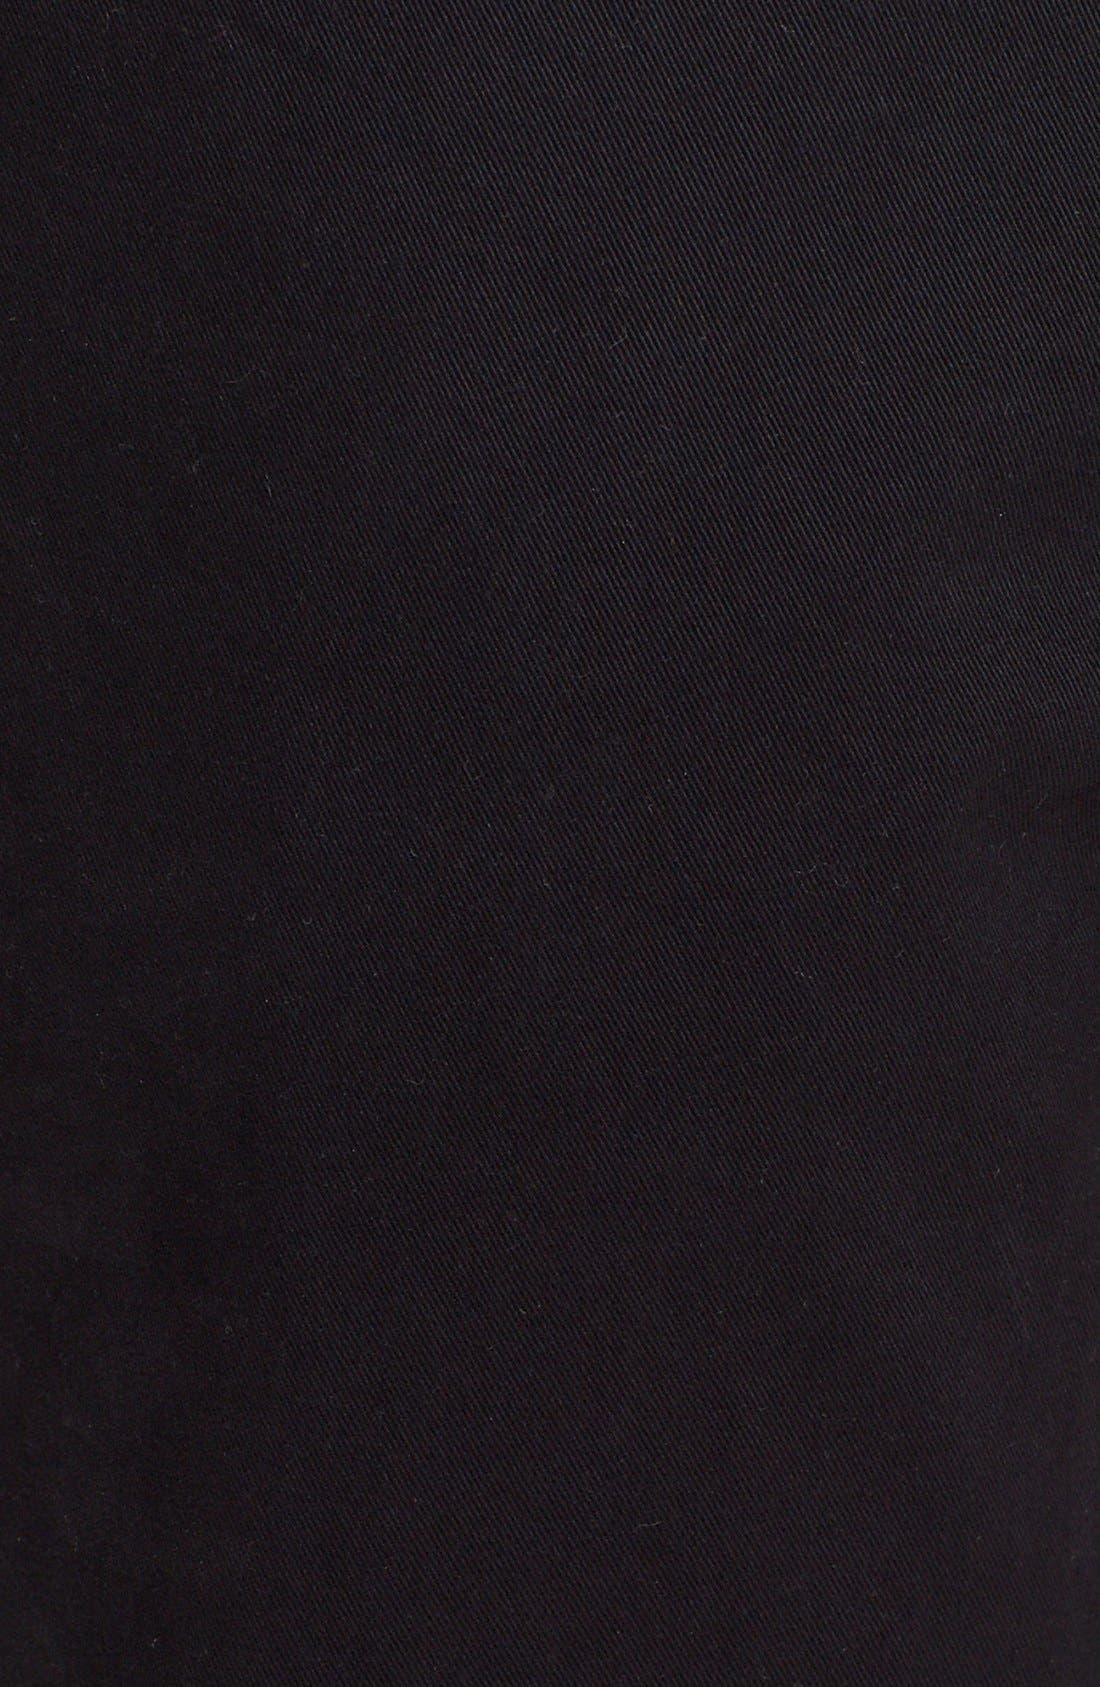 Alternate Image 5  - rag & bone 'Fit 2' Cotton Twill Pants (Nordstrom Exclusive)